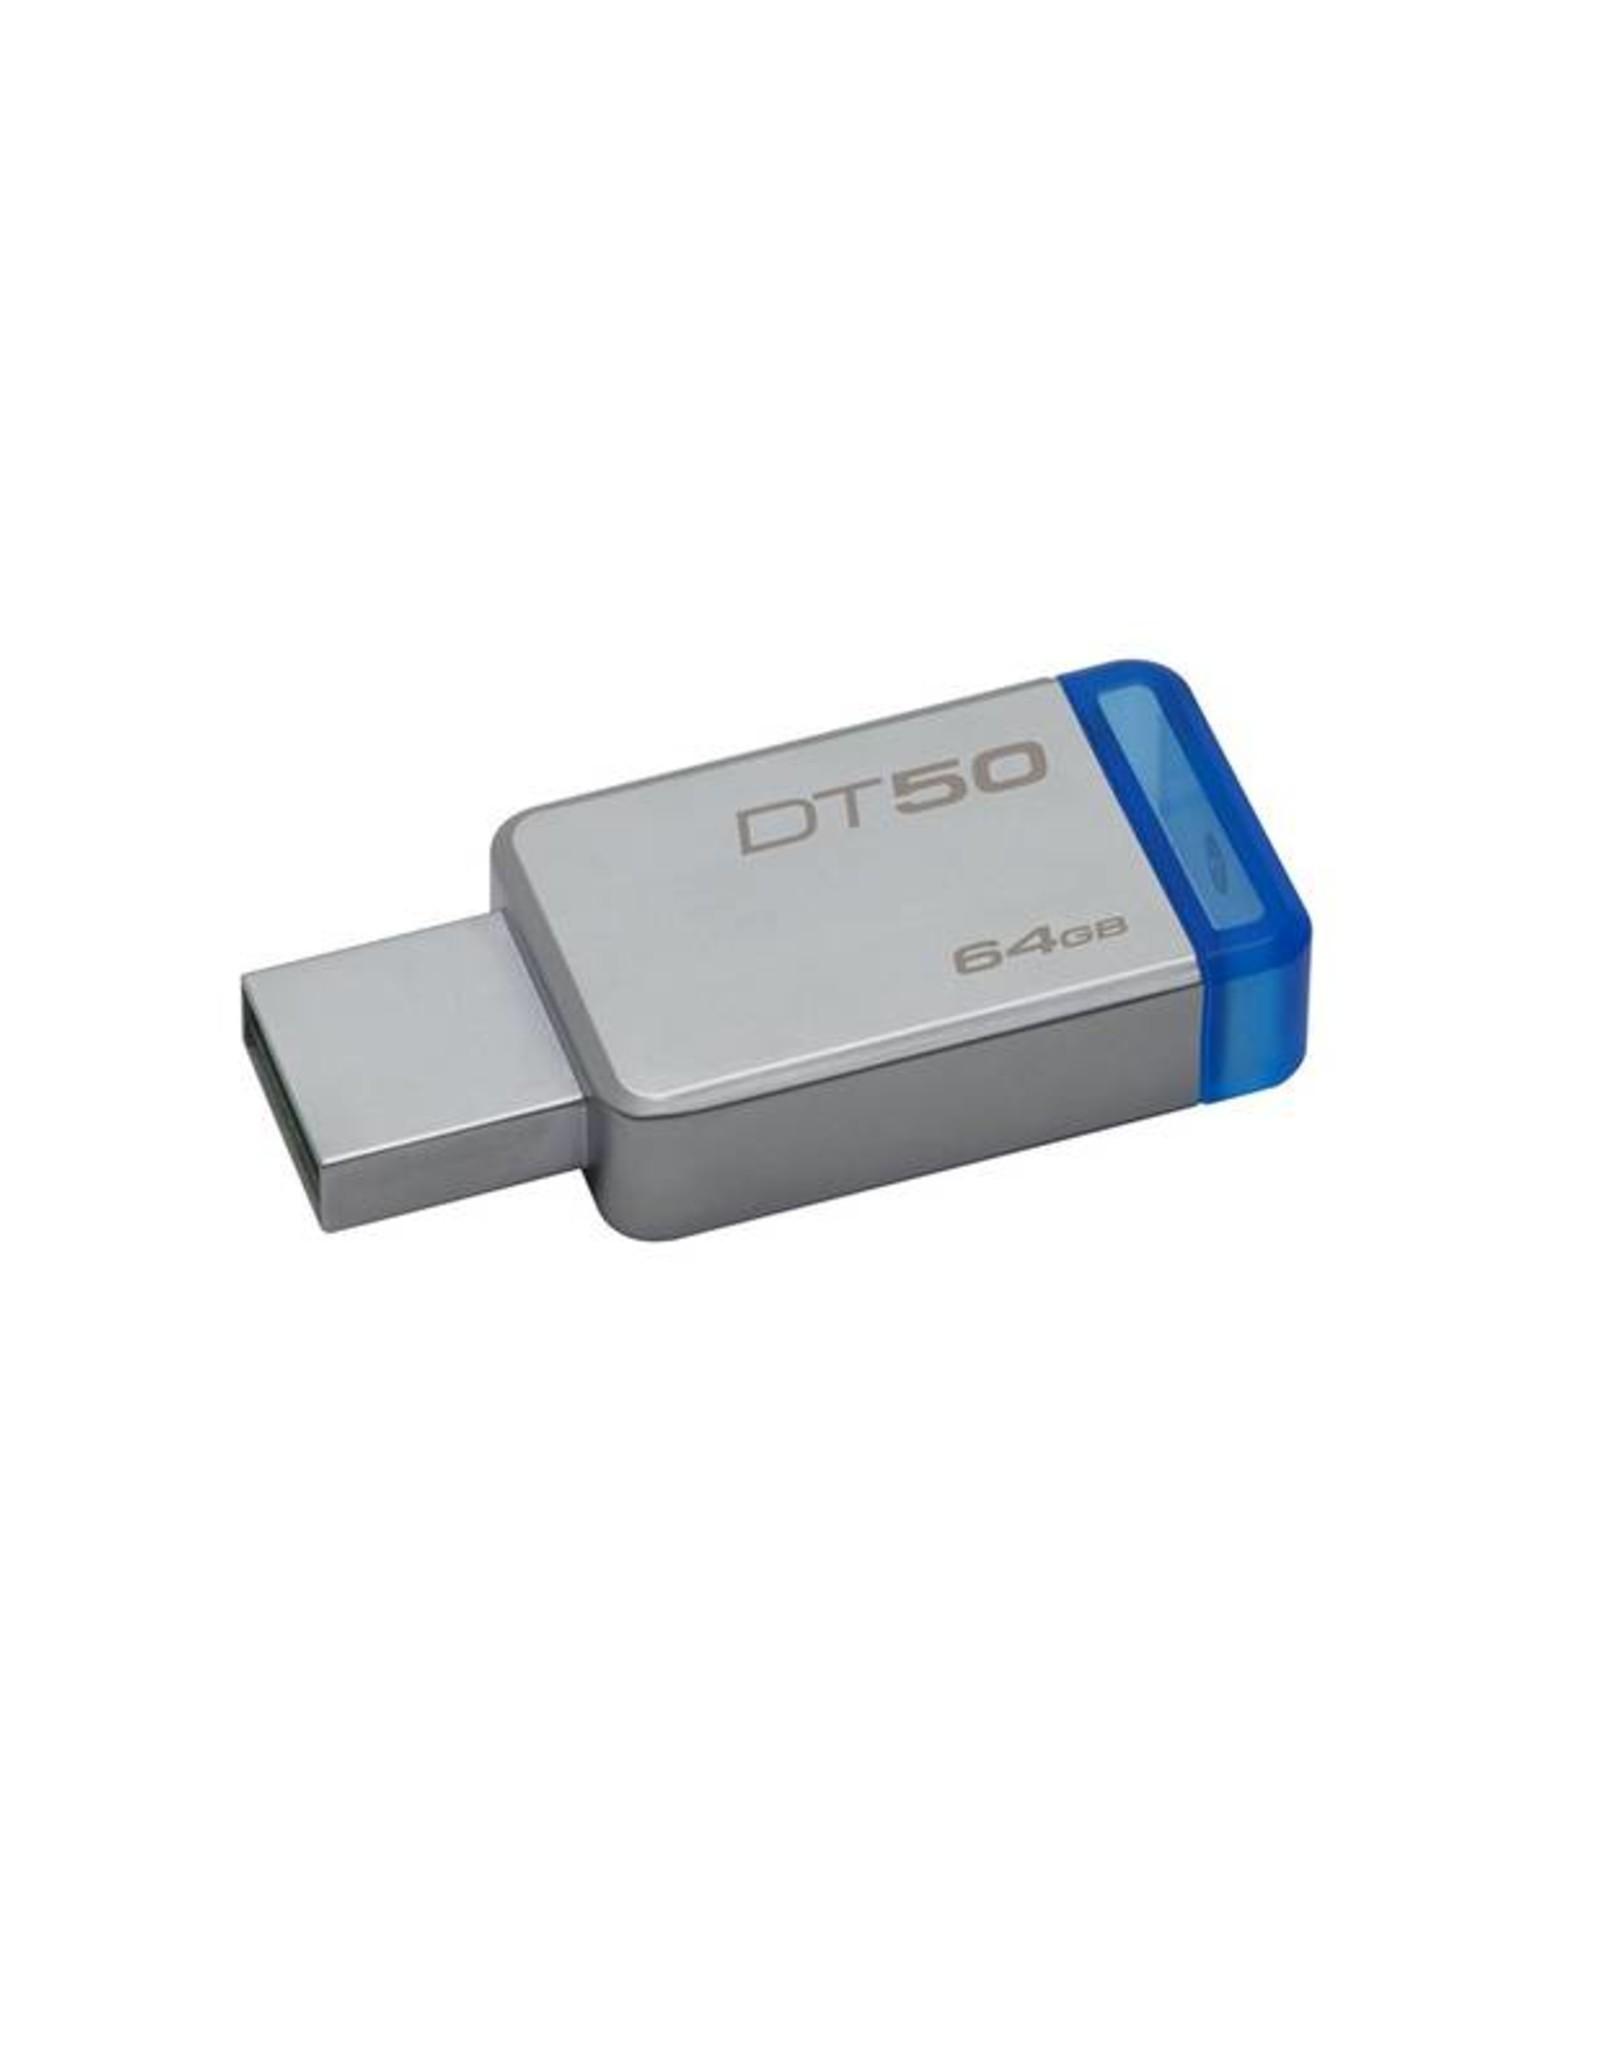 KINGSTON KINGSTON 64GB DATATRAVELER 50 USB 3.0 FLASH DRIVE